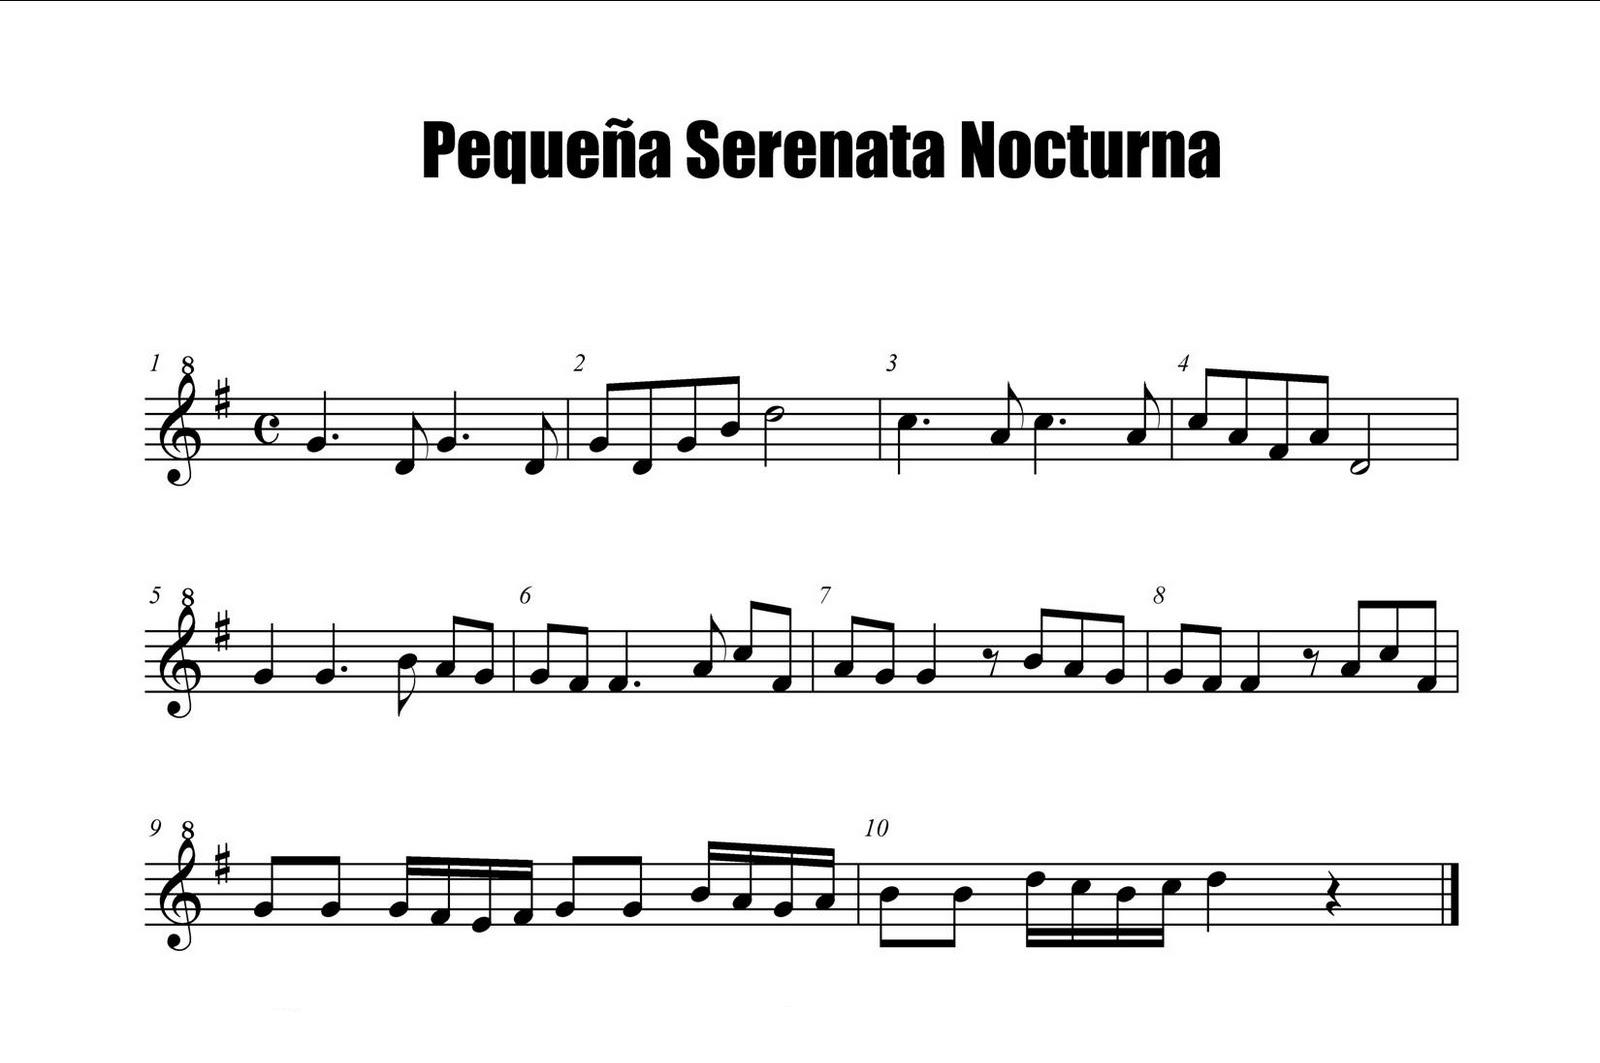 Sonata Nocturna - The Darkest Winter